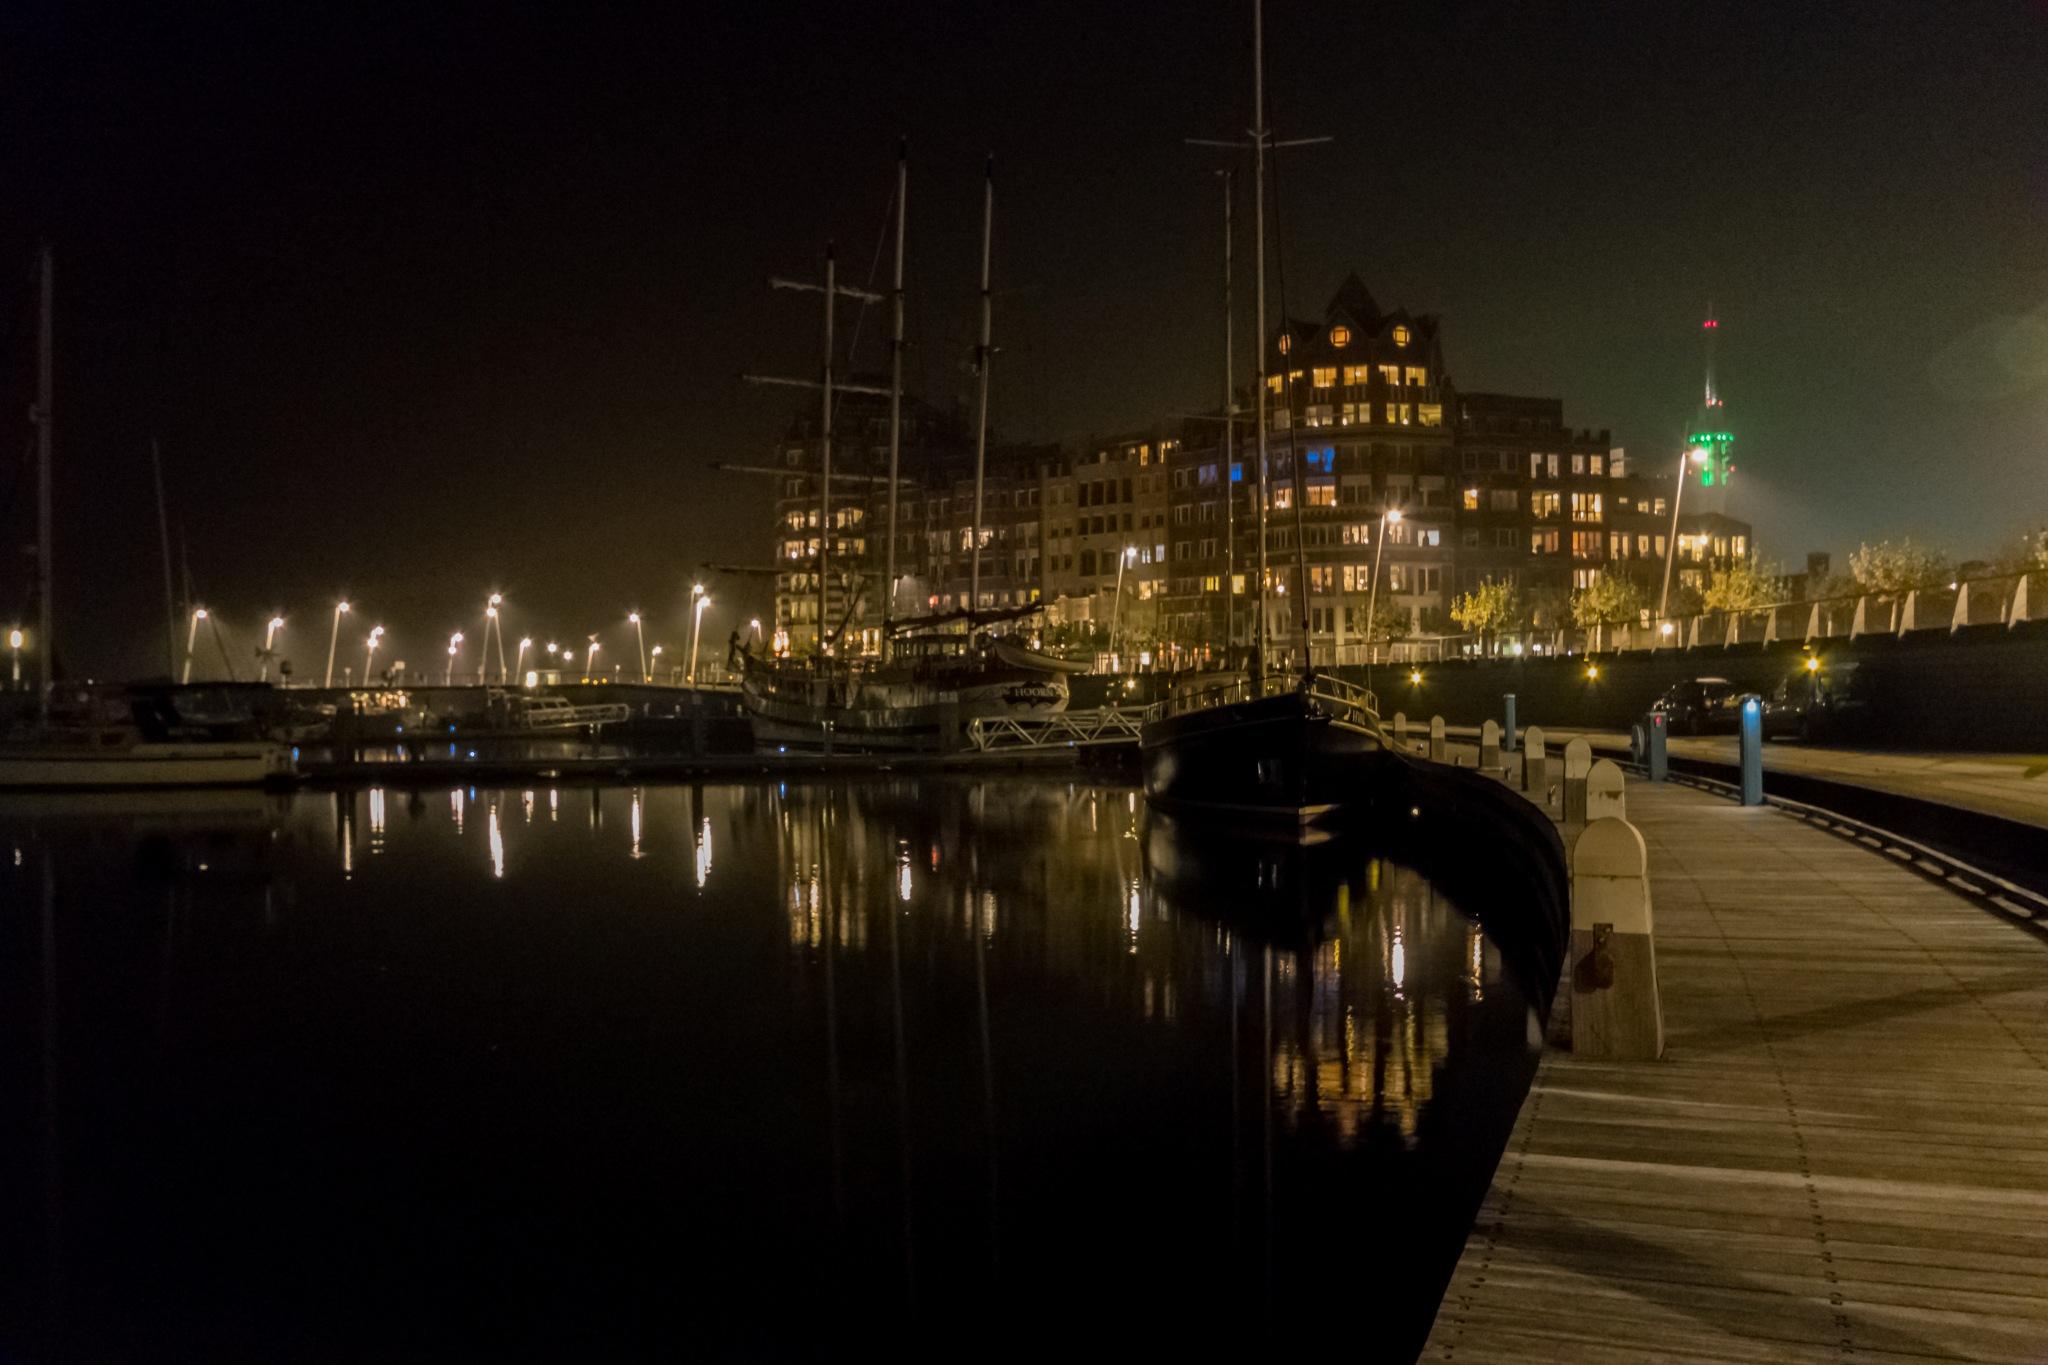 Harbour at night by biljana.plasschaert